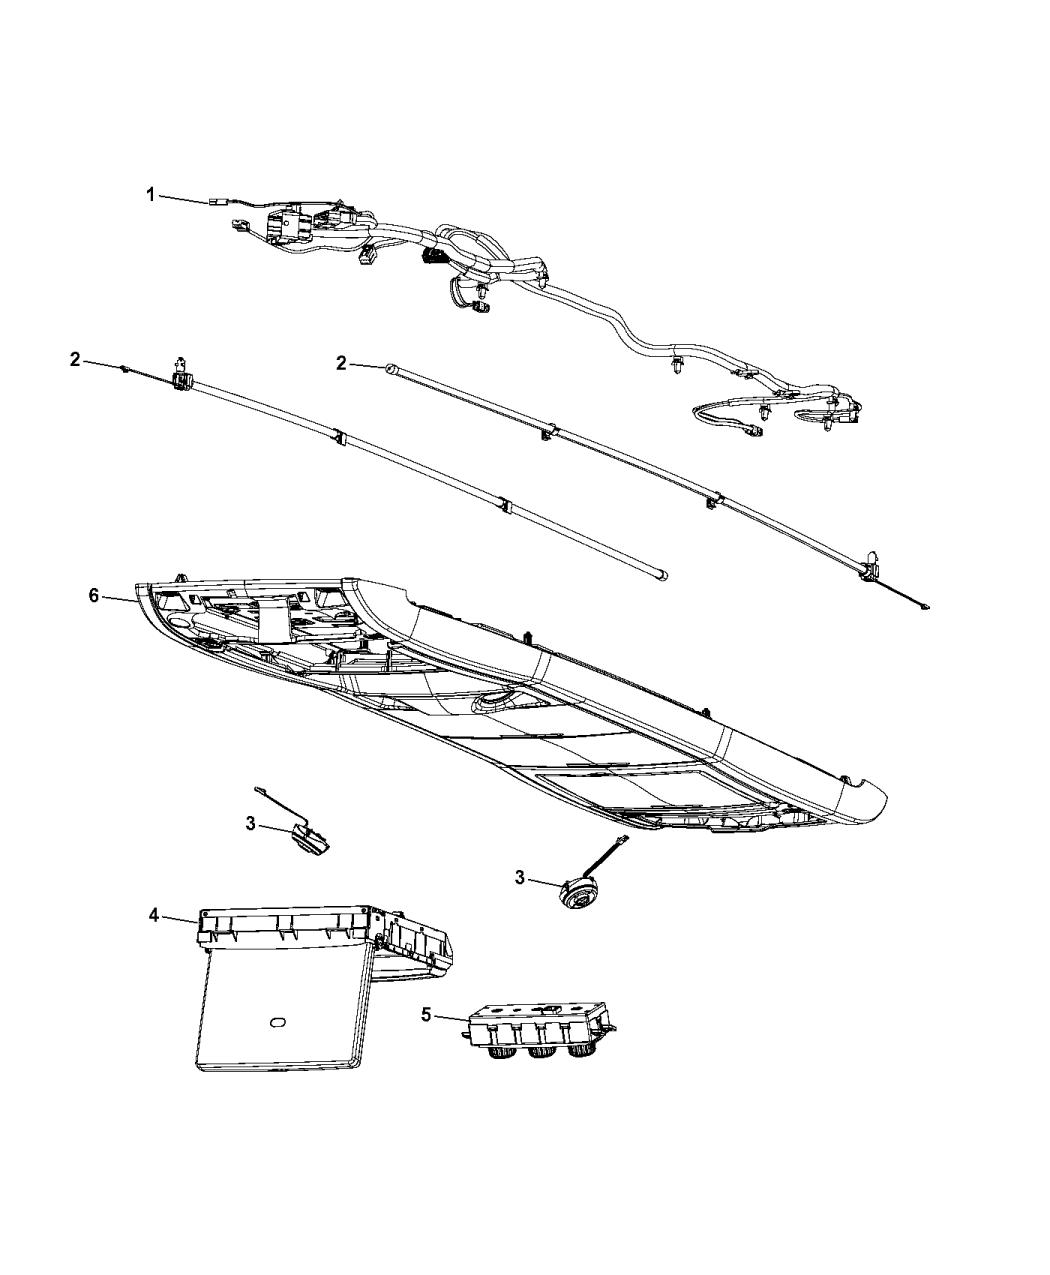 2014 Dodge Grand Caravan Console Single Video Monitor Long Overhead Wiring Diagram